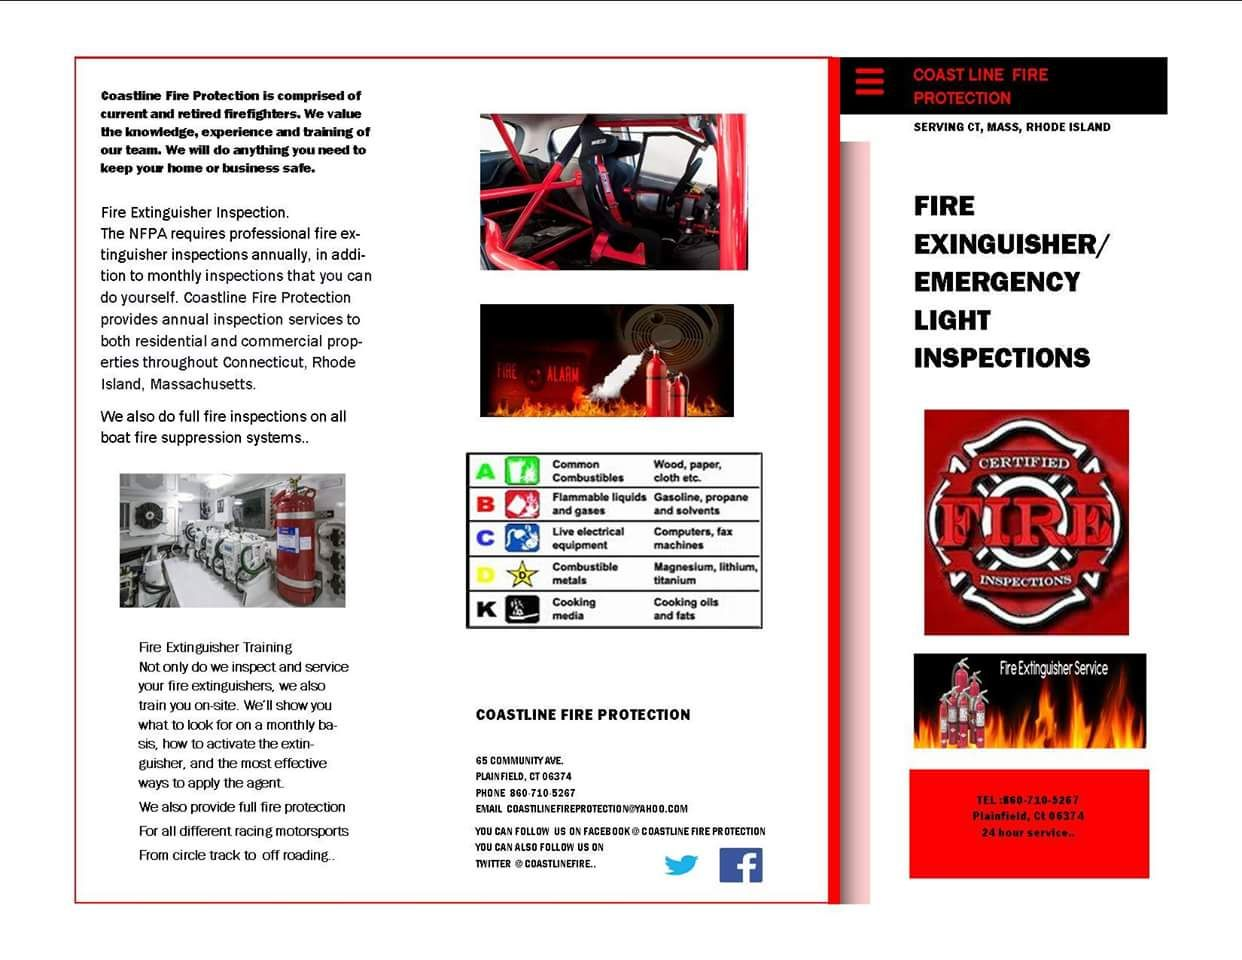 Coastline Fire Protection Brochure Fire protection, Fire